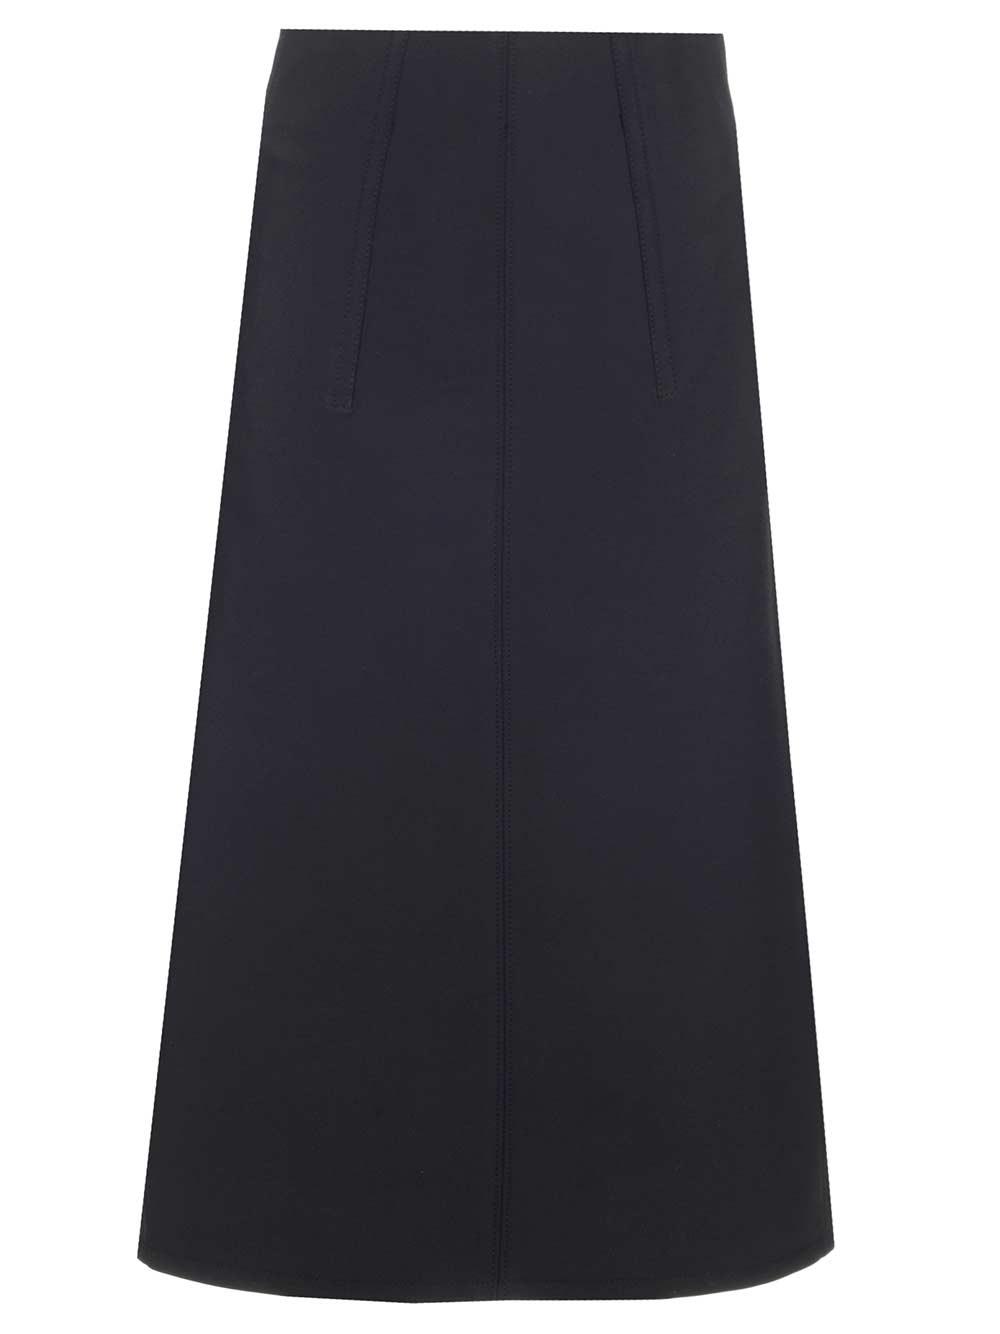 MONCLER GENIUS Skirt - 2 Moncler 1952